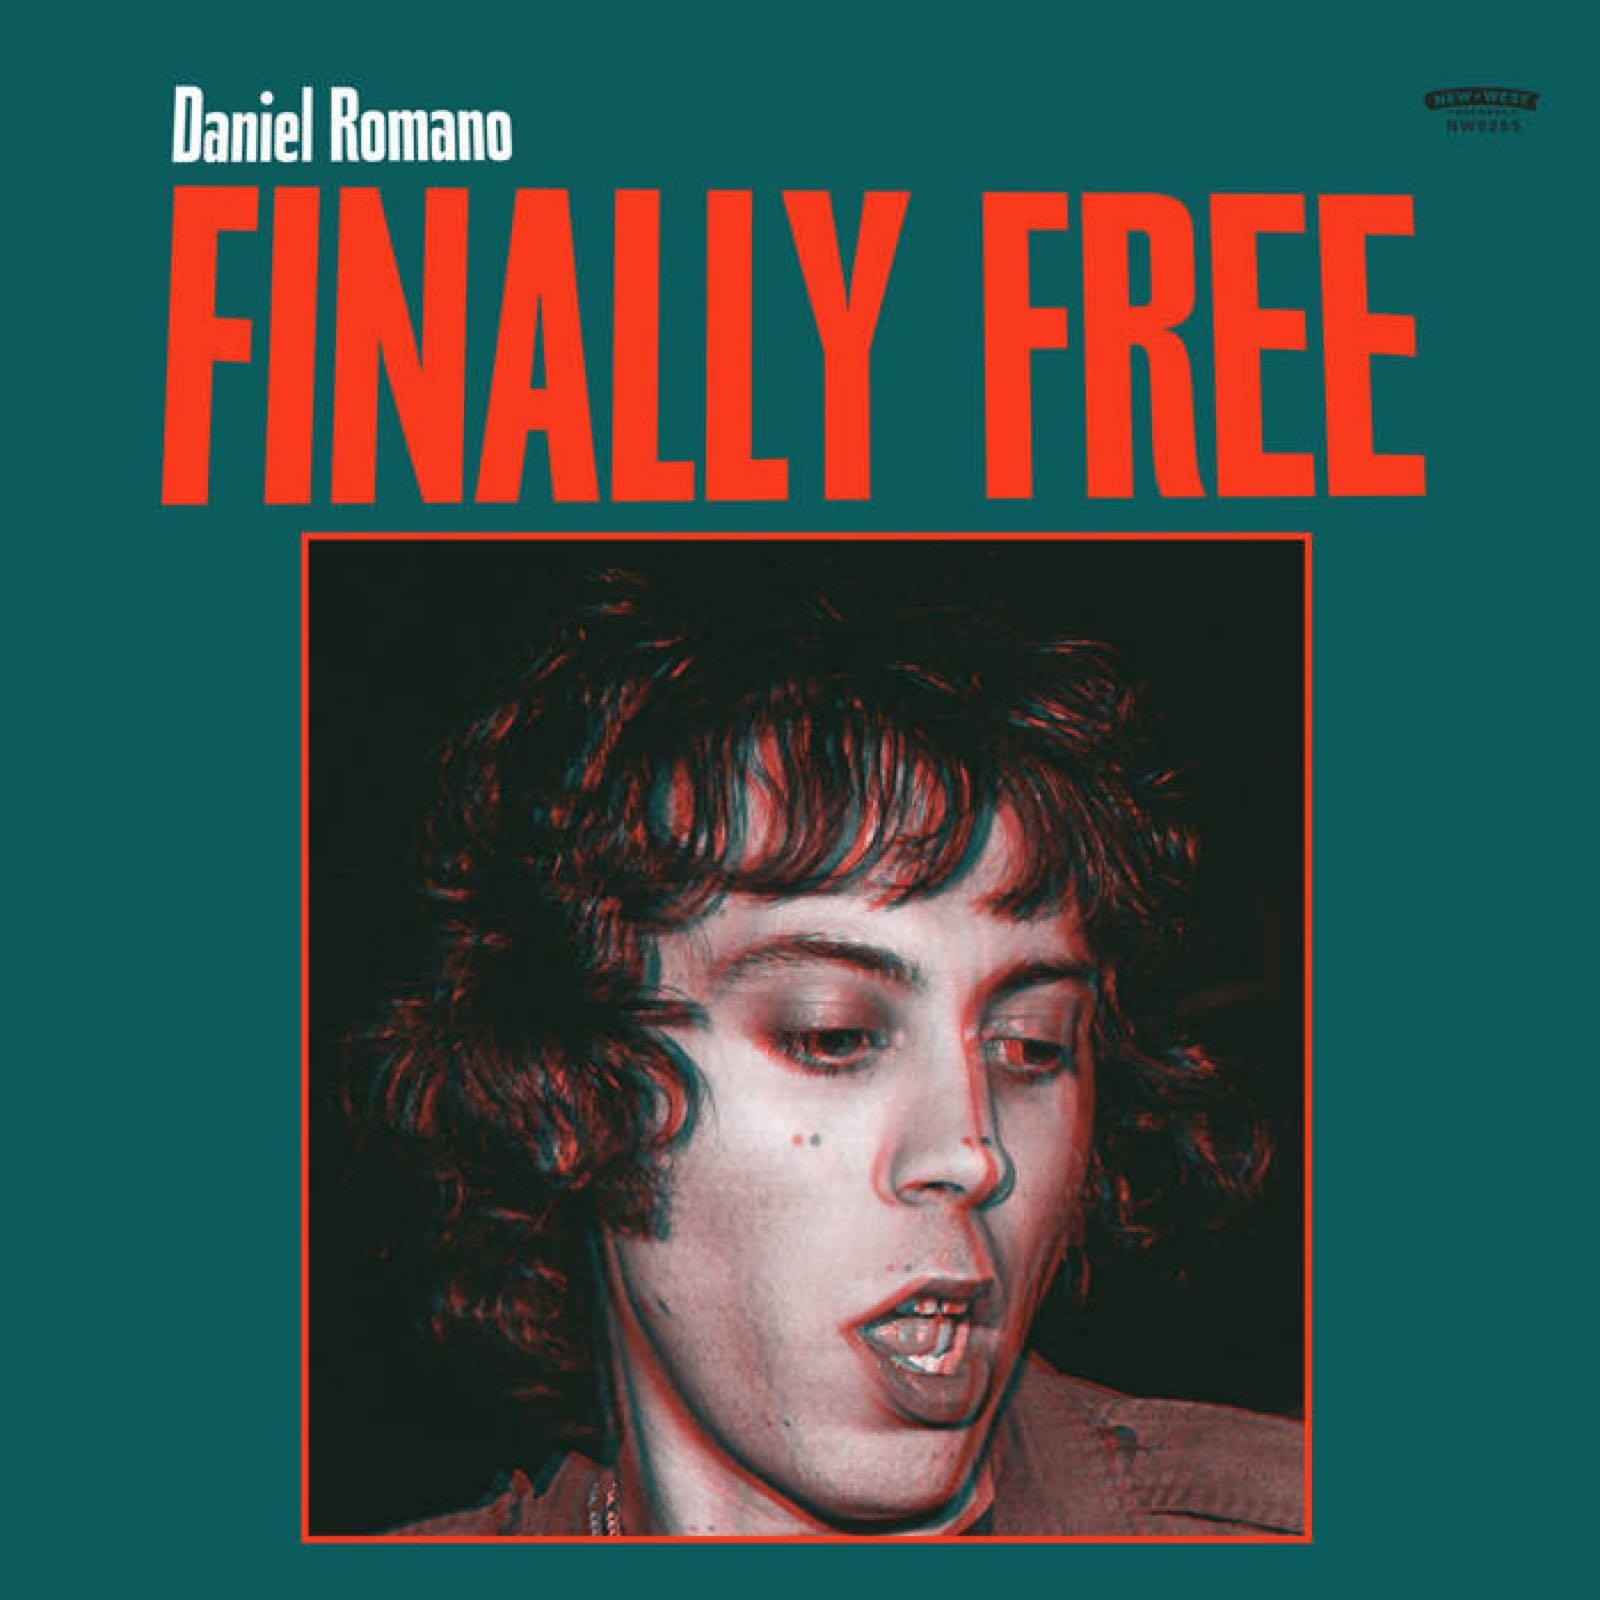 Daniel Romano - Finally Free [LP]